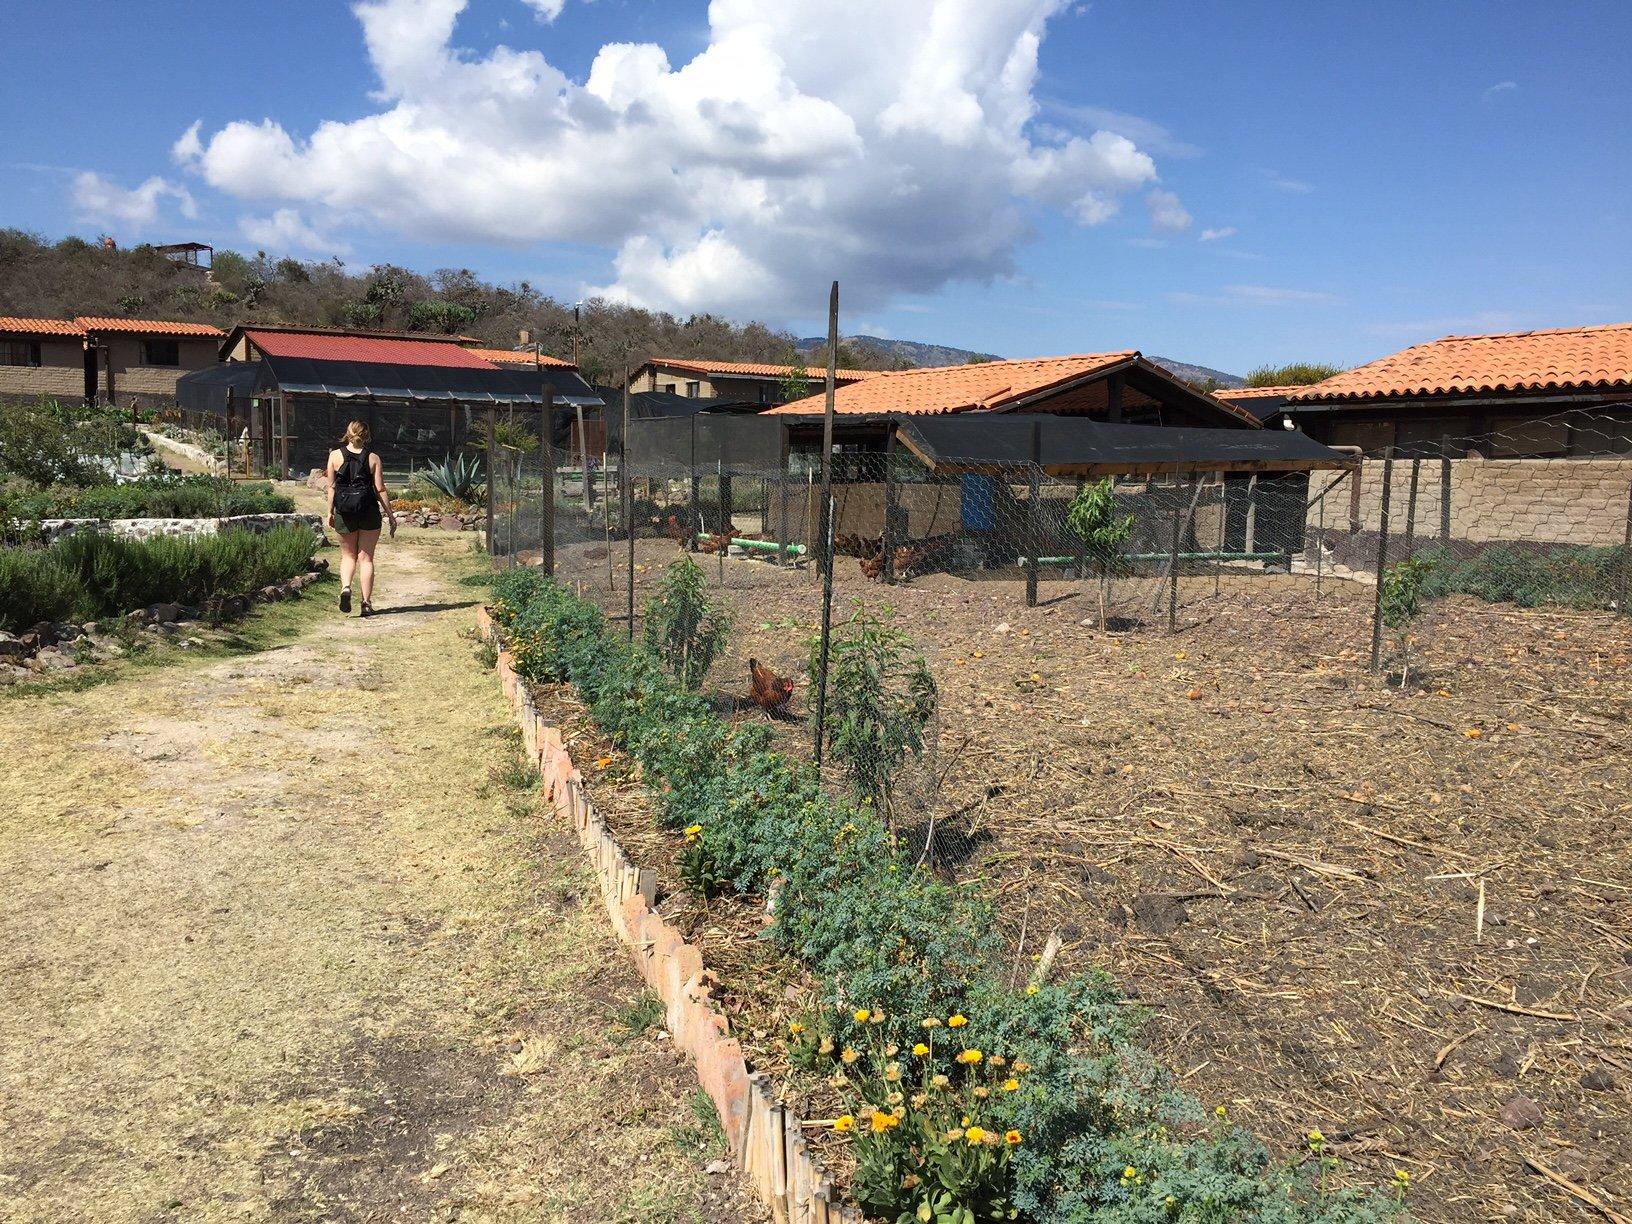 Planting food at farm